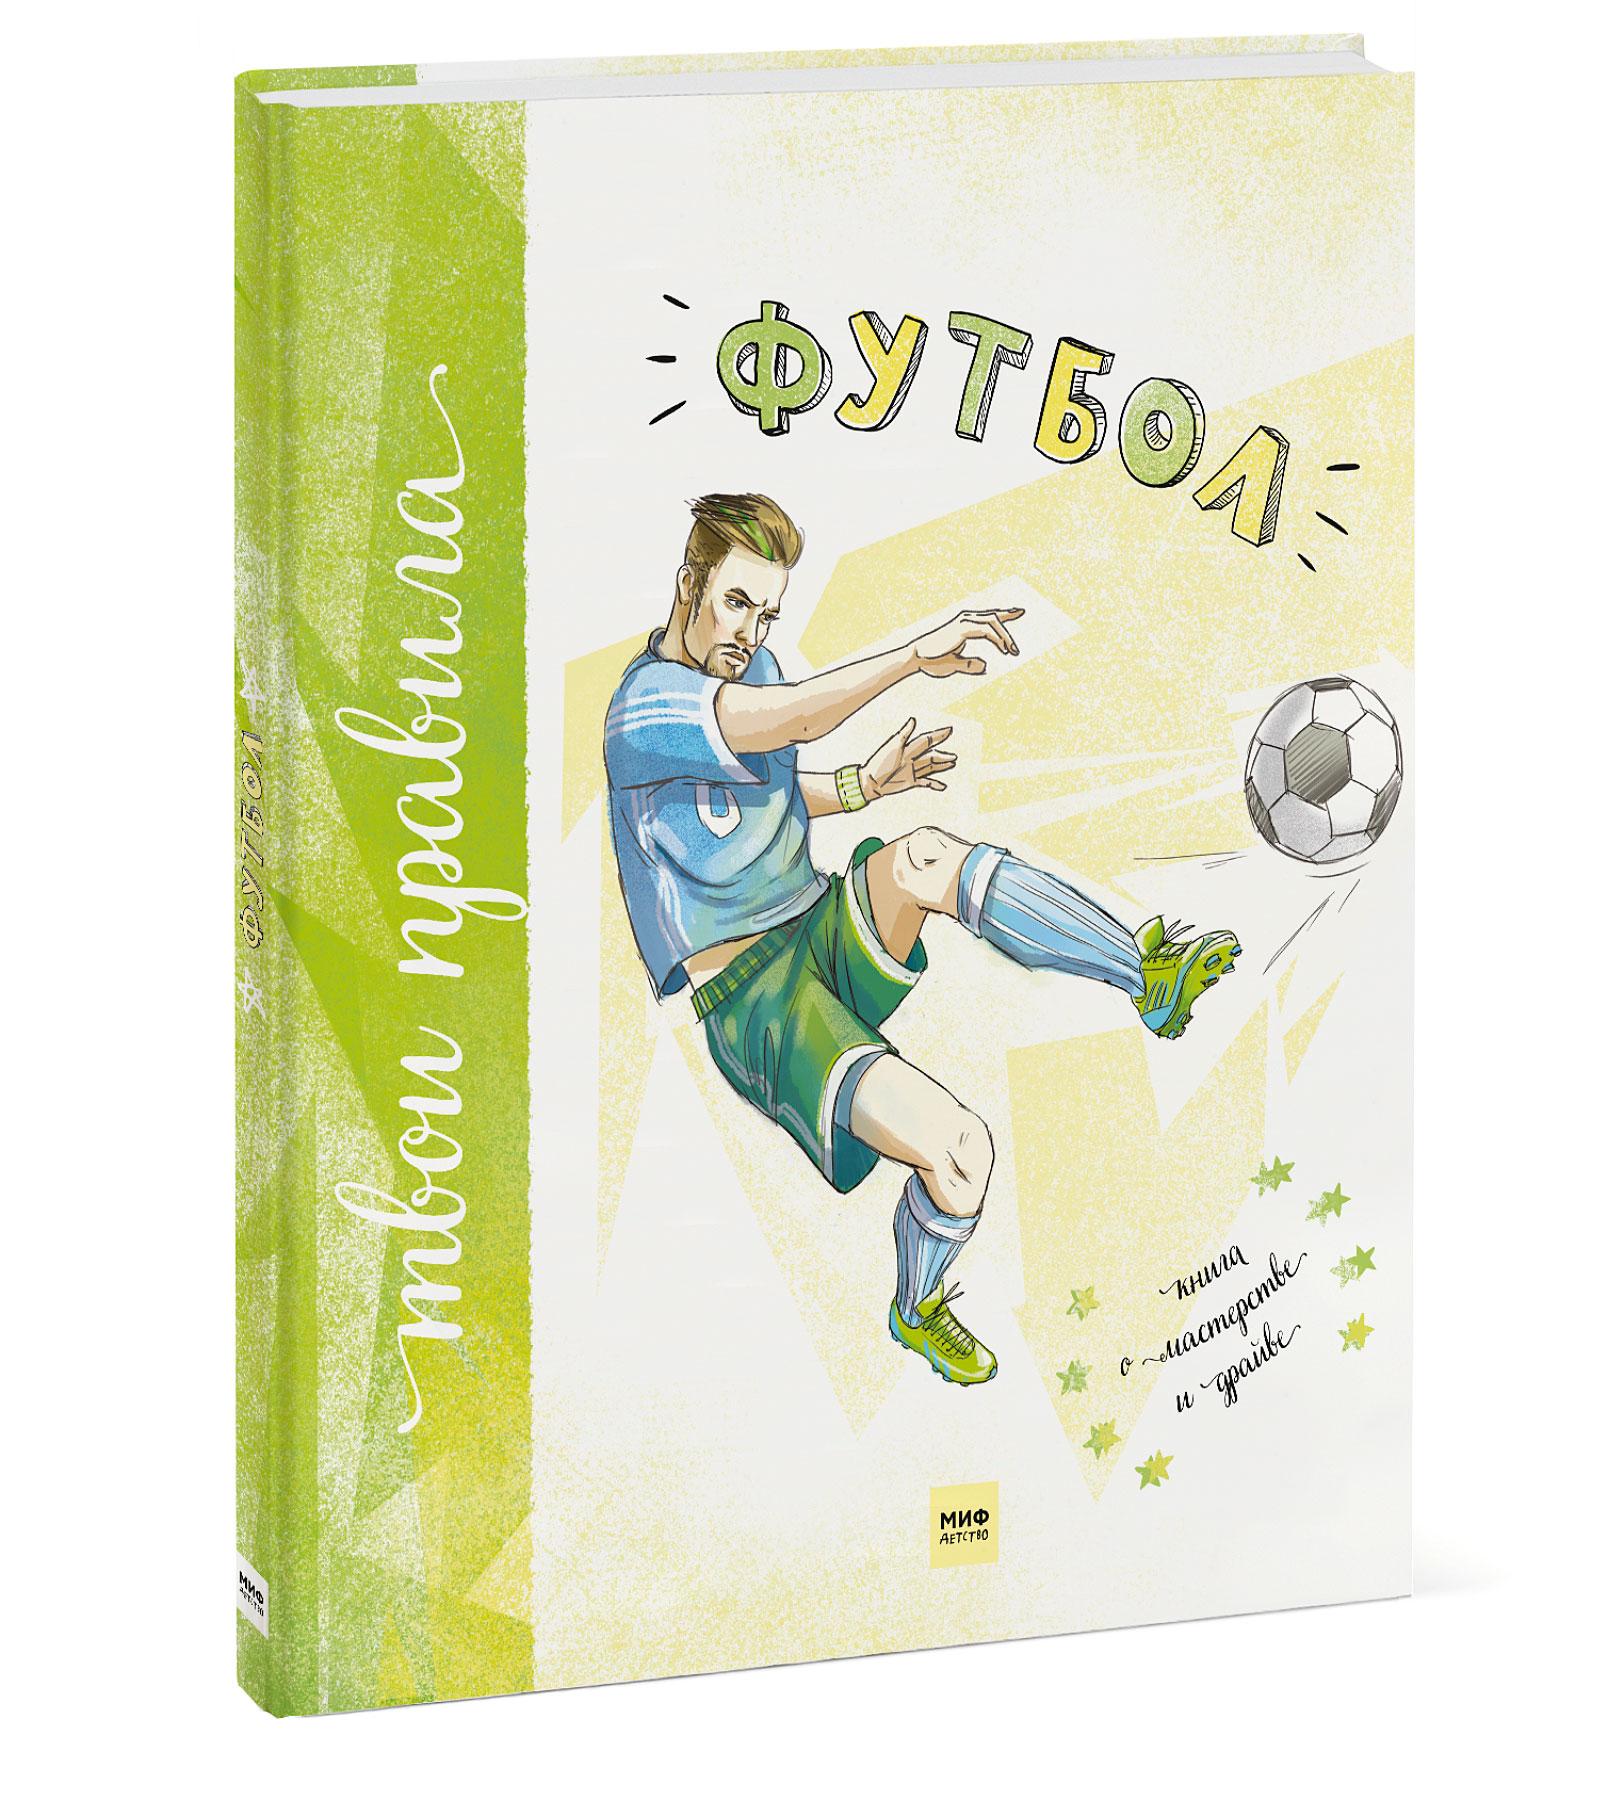 Футбол. Книга о мастерстве и драйве. Александр Муйжнек